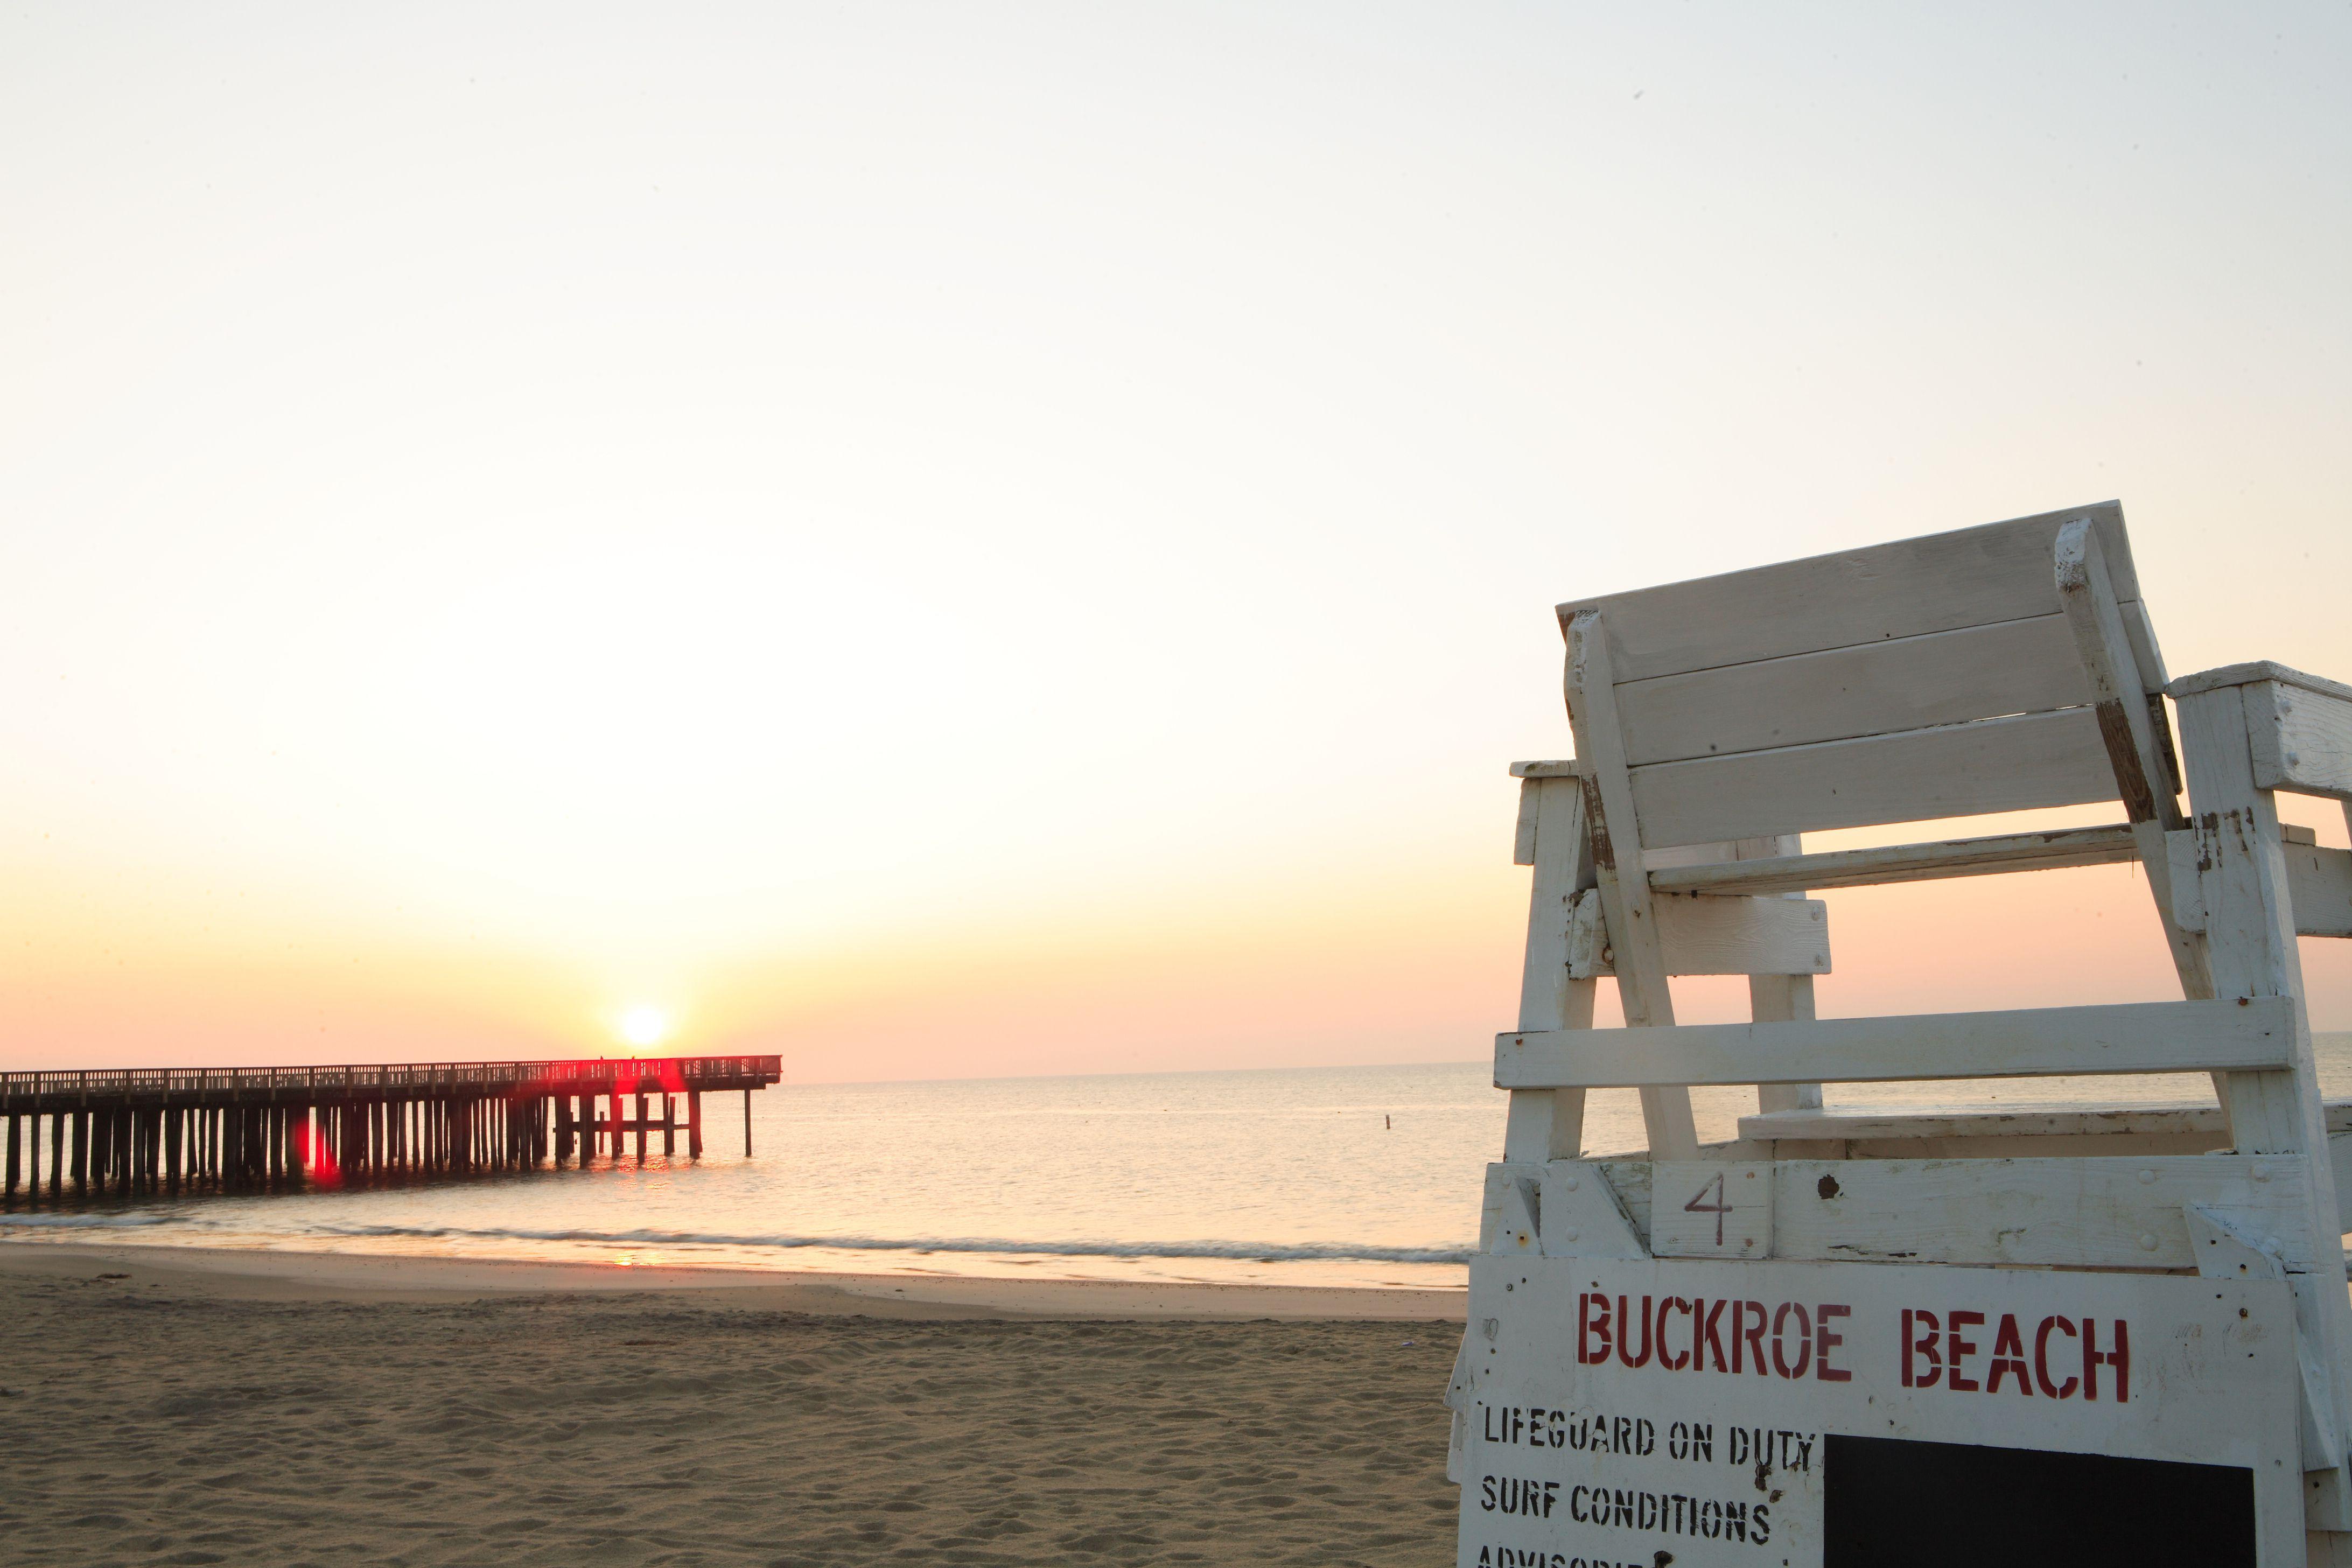 Buckroe Beach